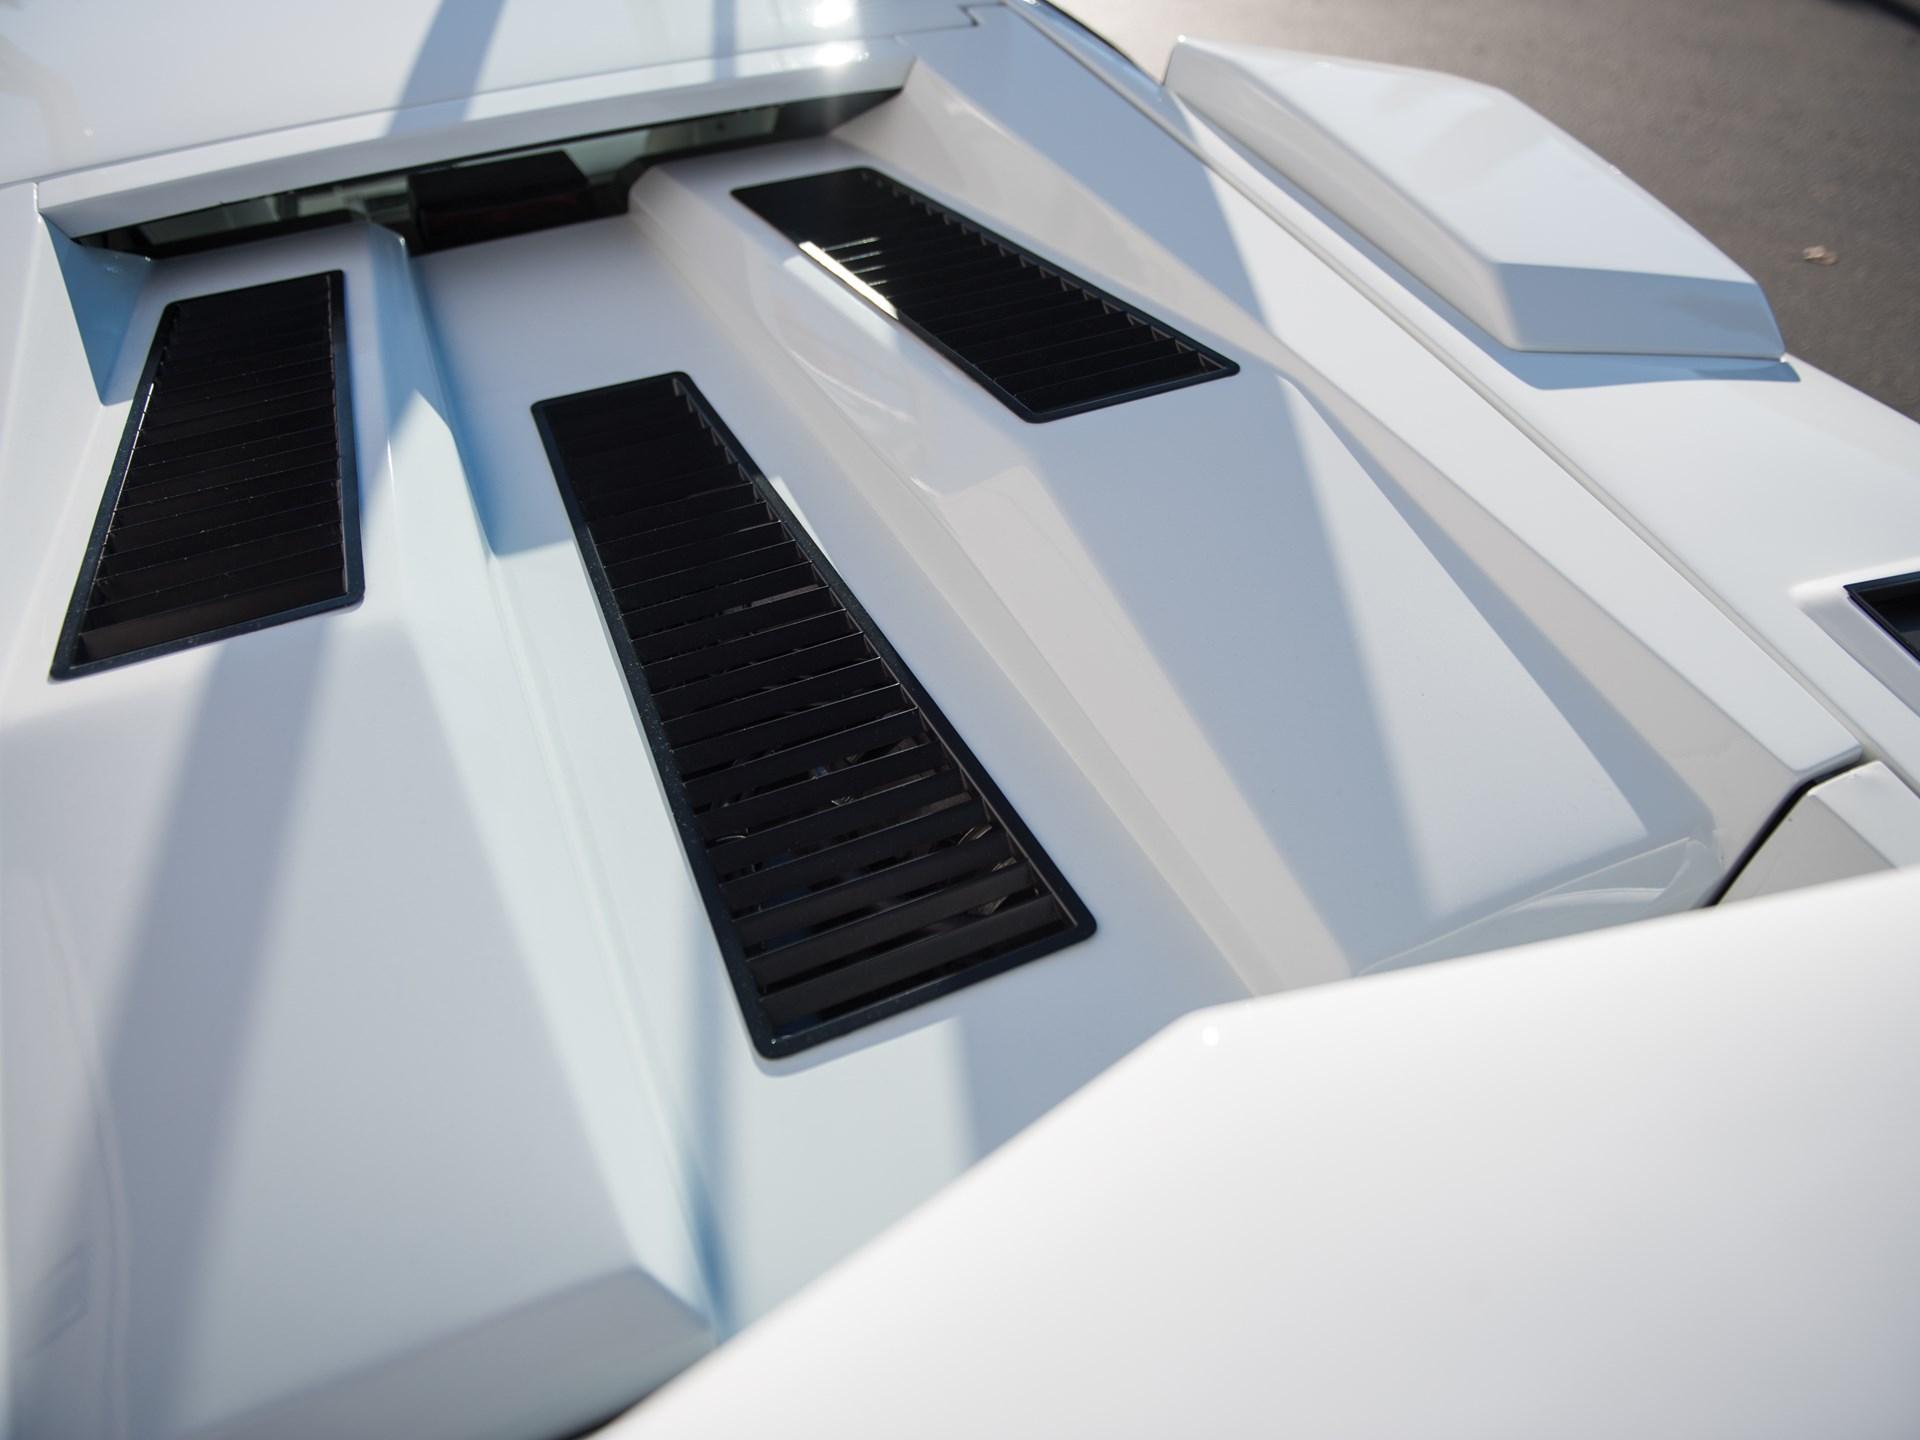 1987 Lamborghini Countach 5000 QV by Bertone